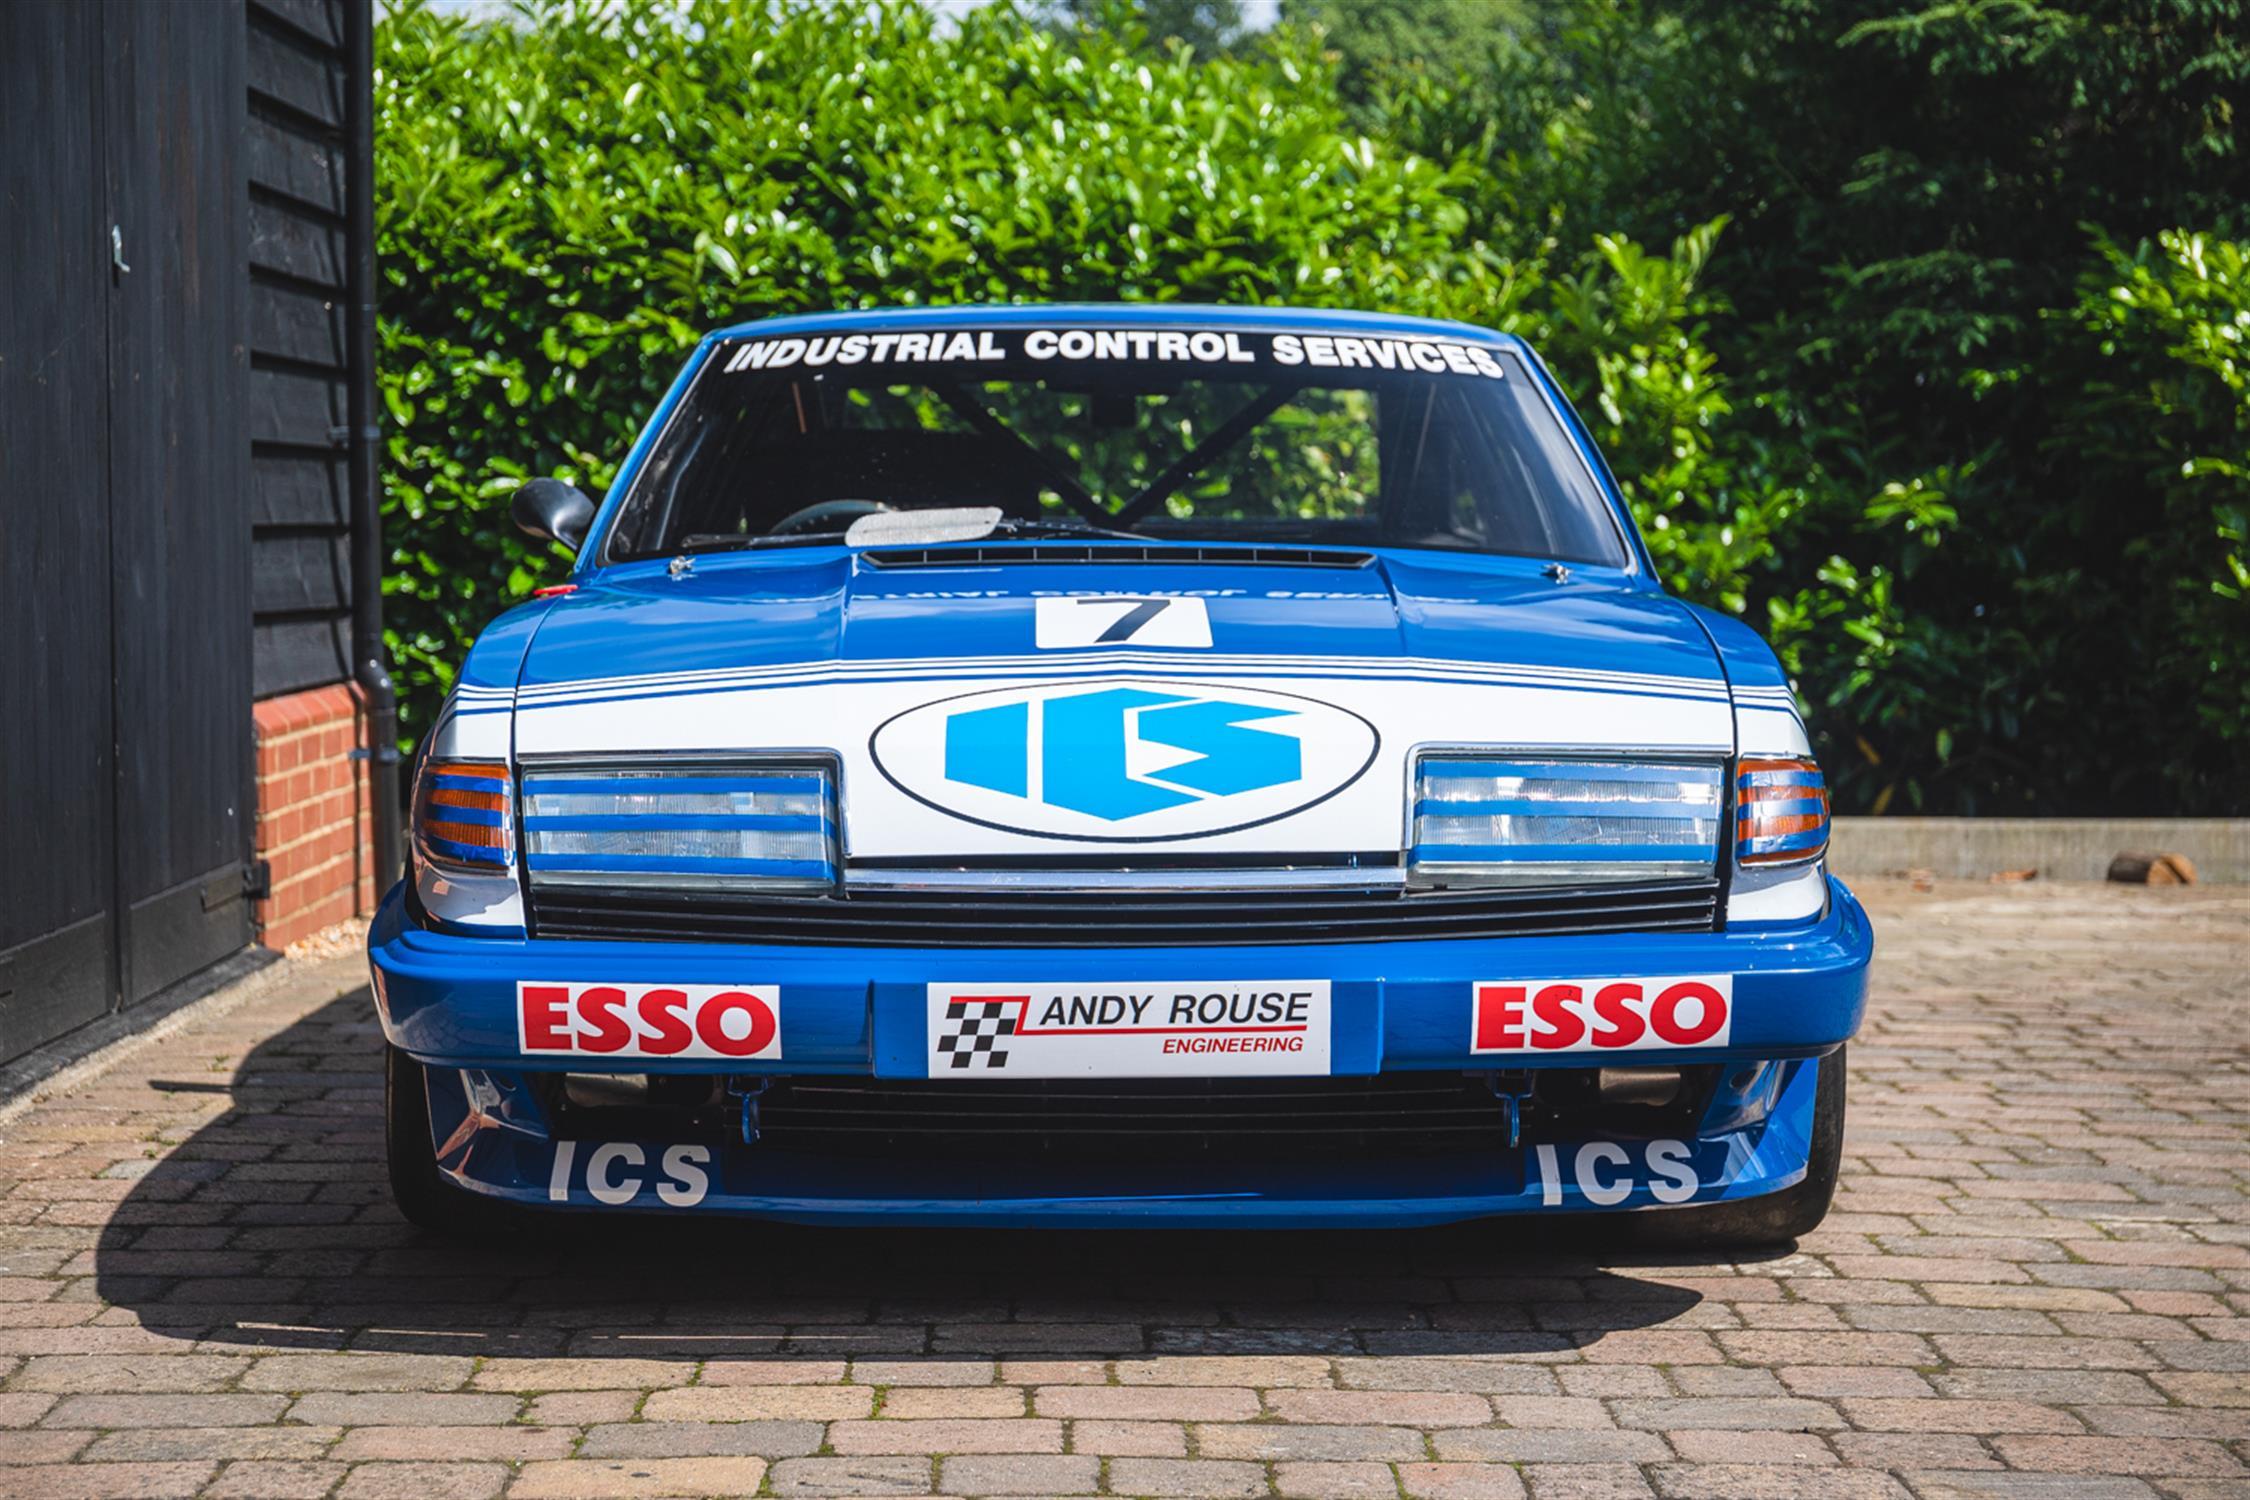 BTCC Championship-Winning 'Group A' ICS Rover Vitesse - Ex-Andy Rouse - Image 8 of 12